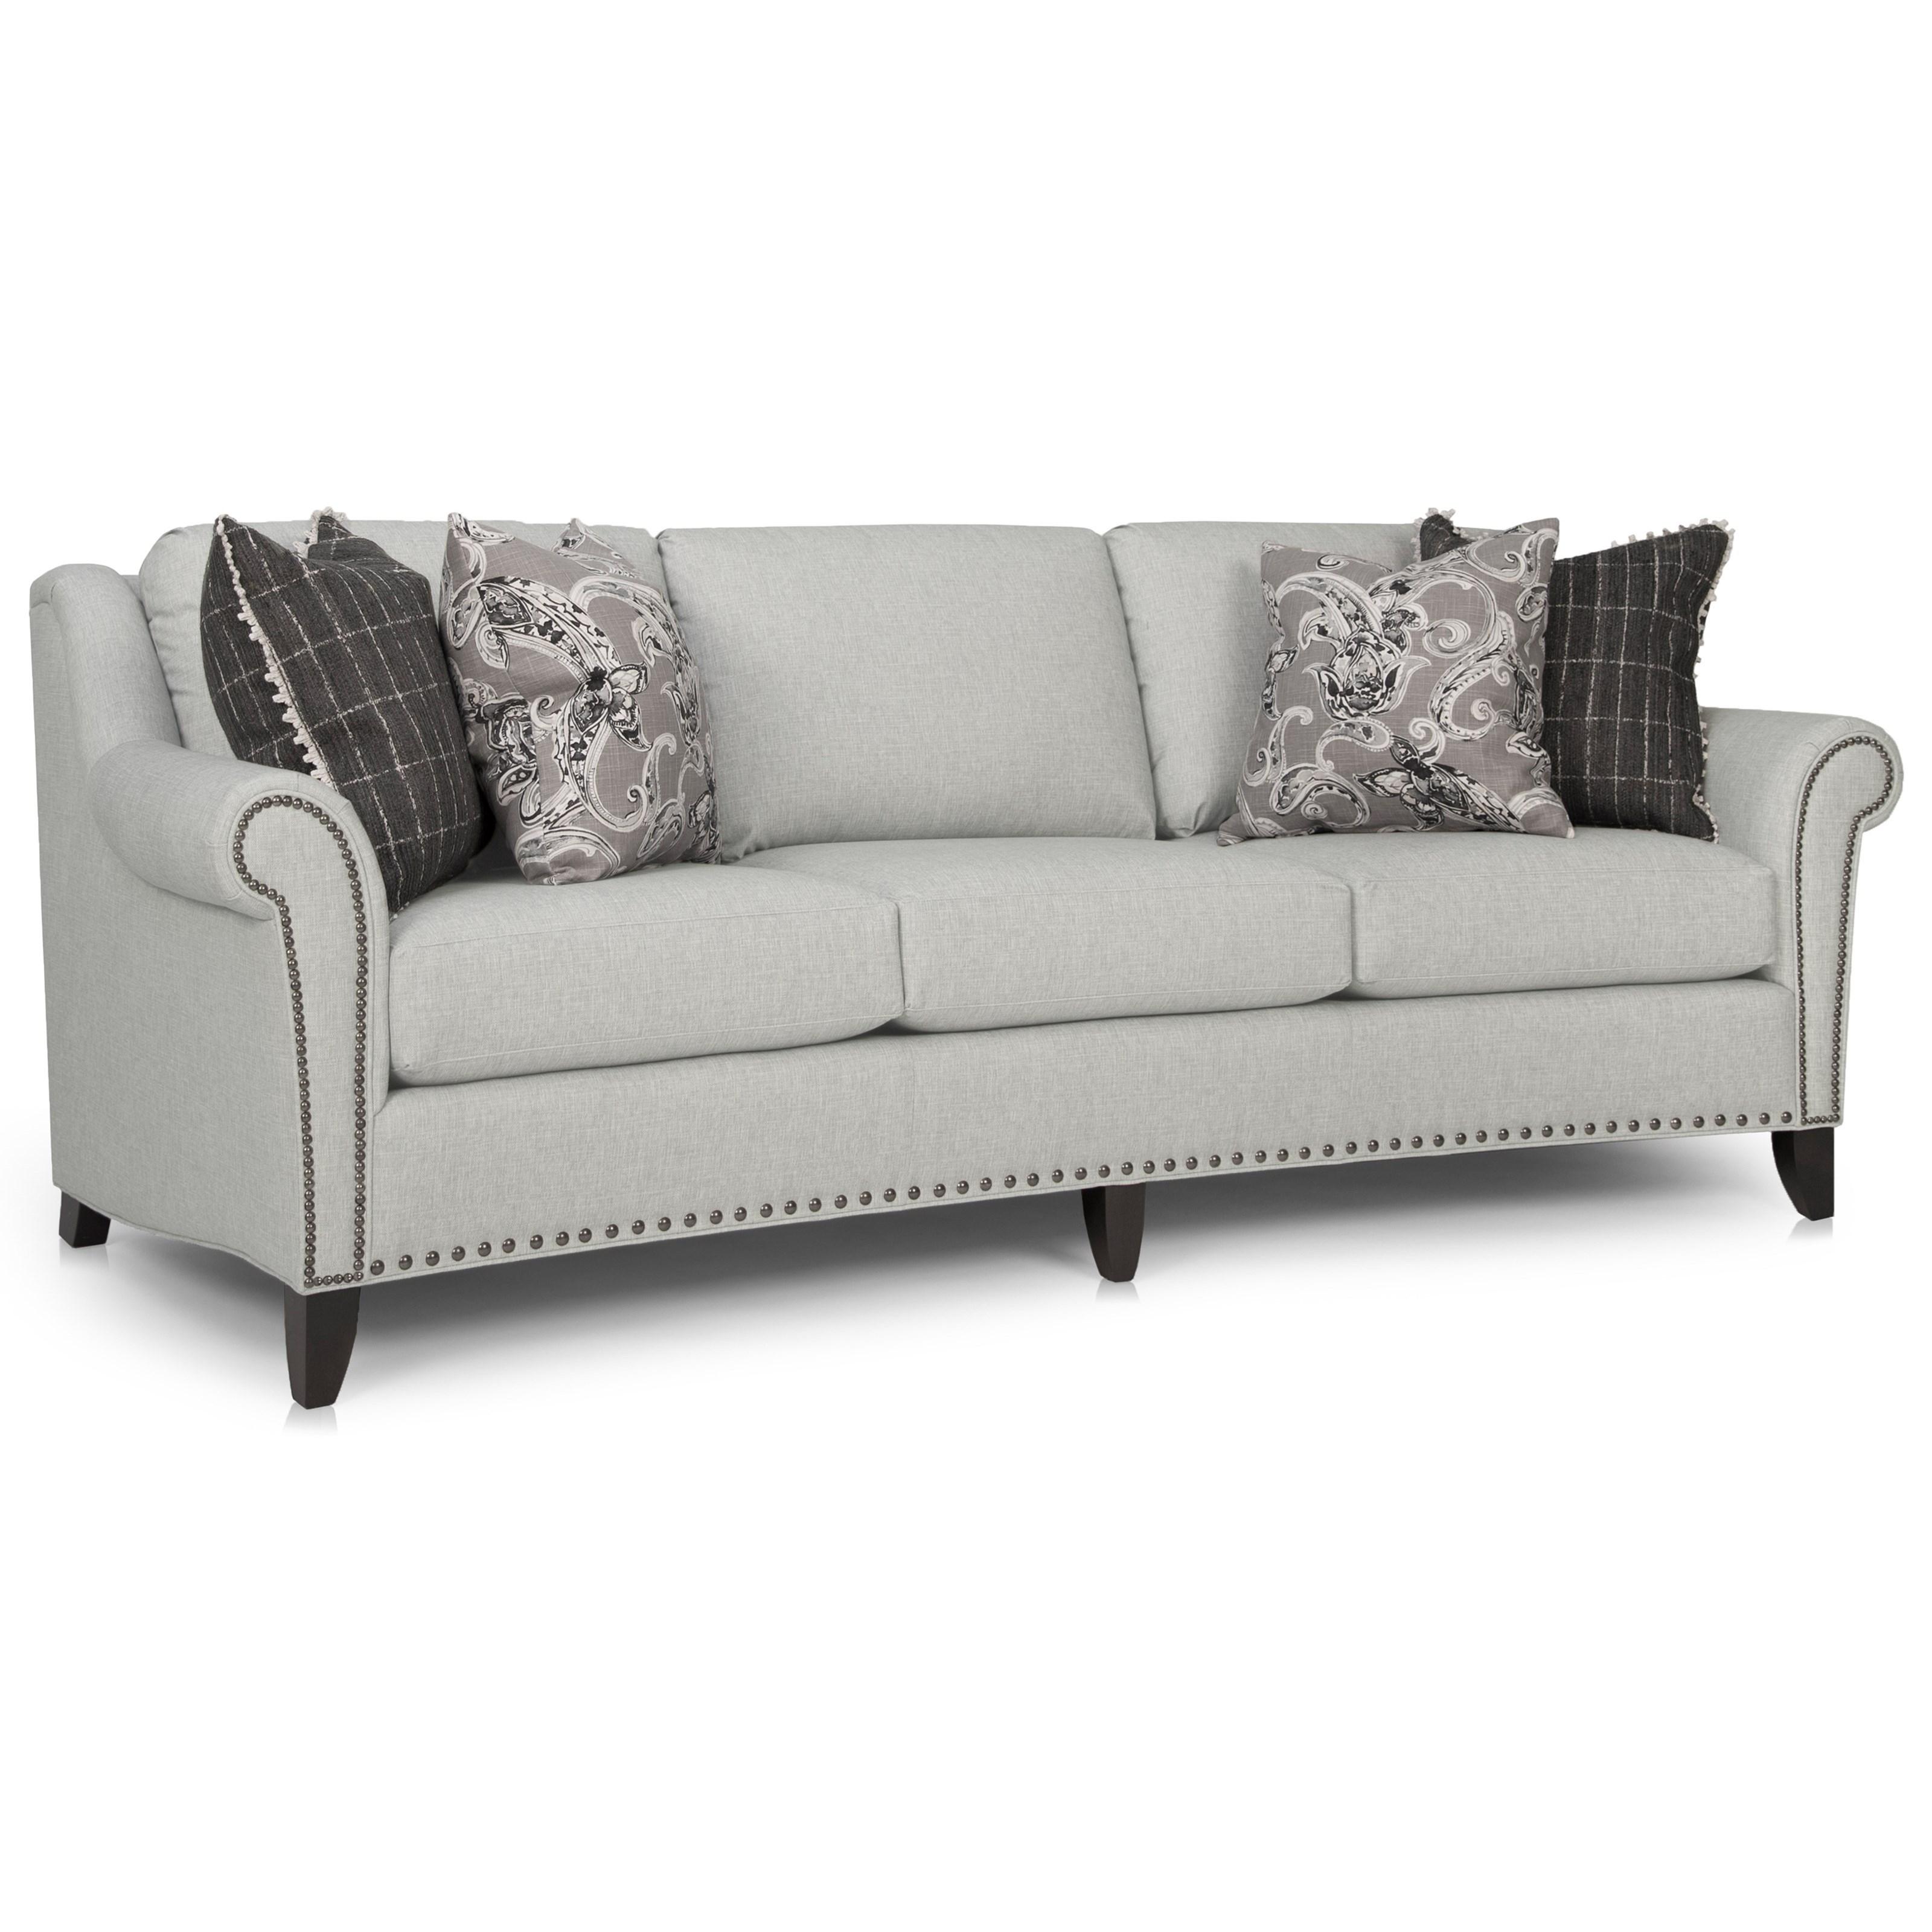 Transitional Large Sofa with Nailhead Trim